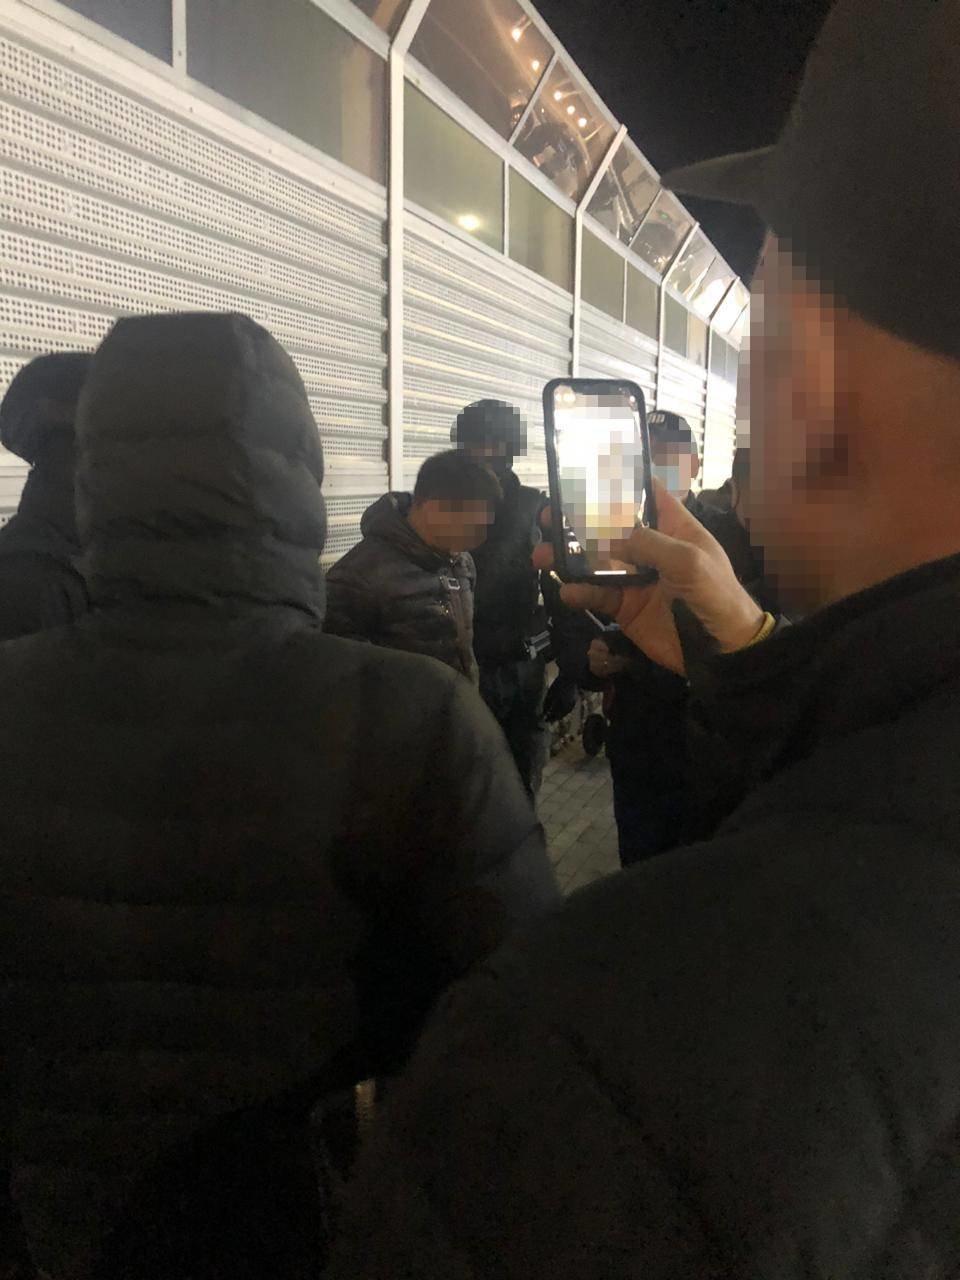 В Харькове силовики задержали сотрудника СБУ, требовавшего взятку за розыск краденого авто, - ФОТО, фото-3